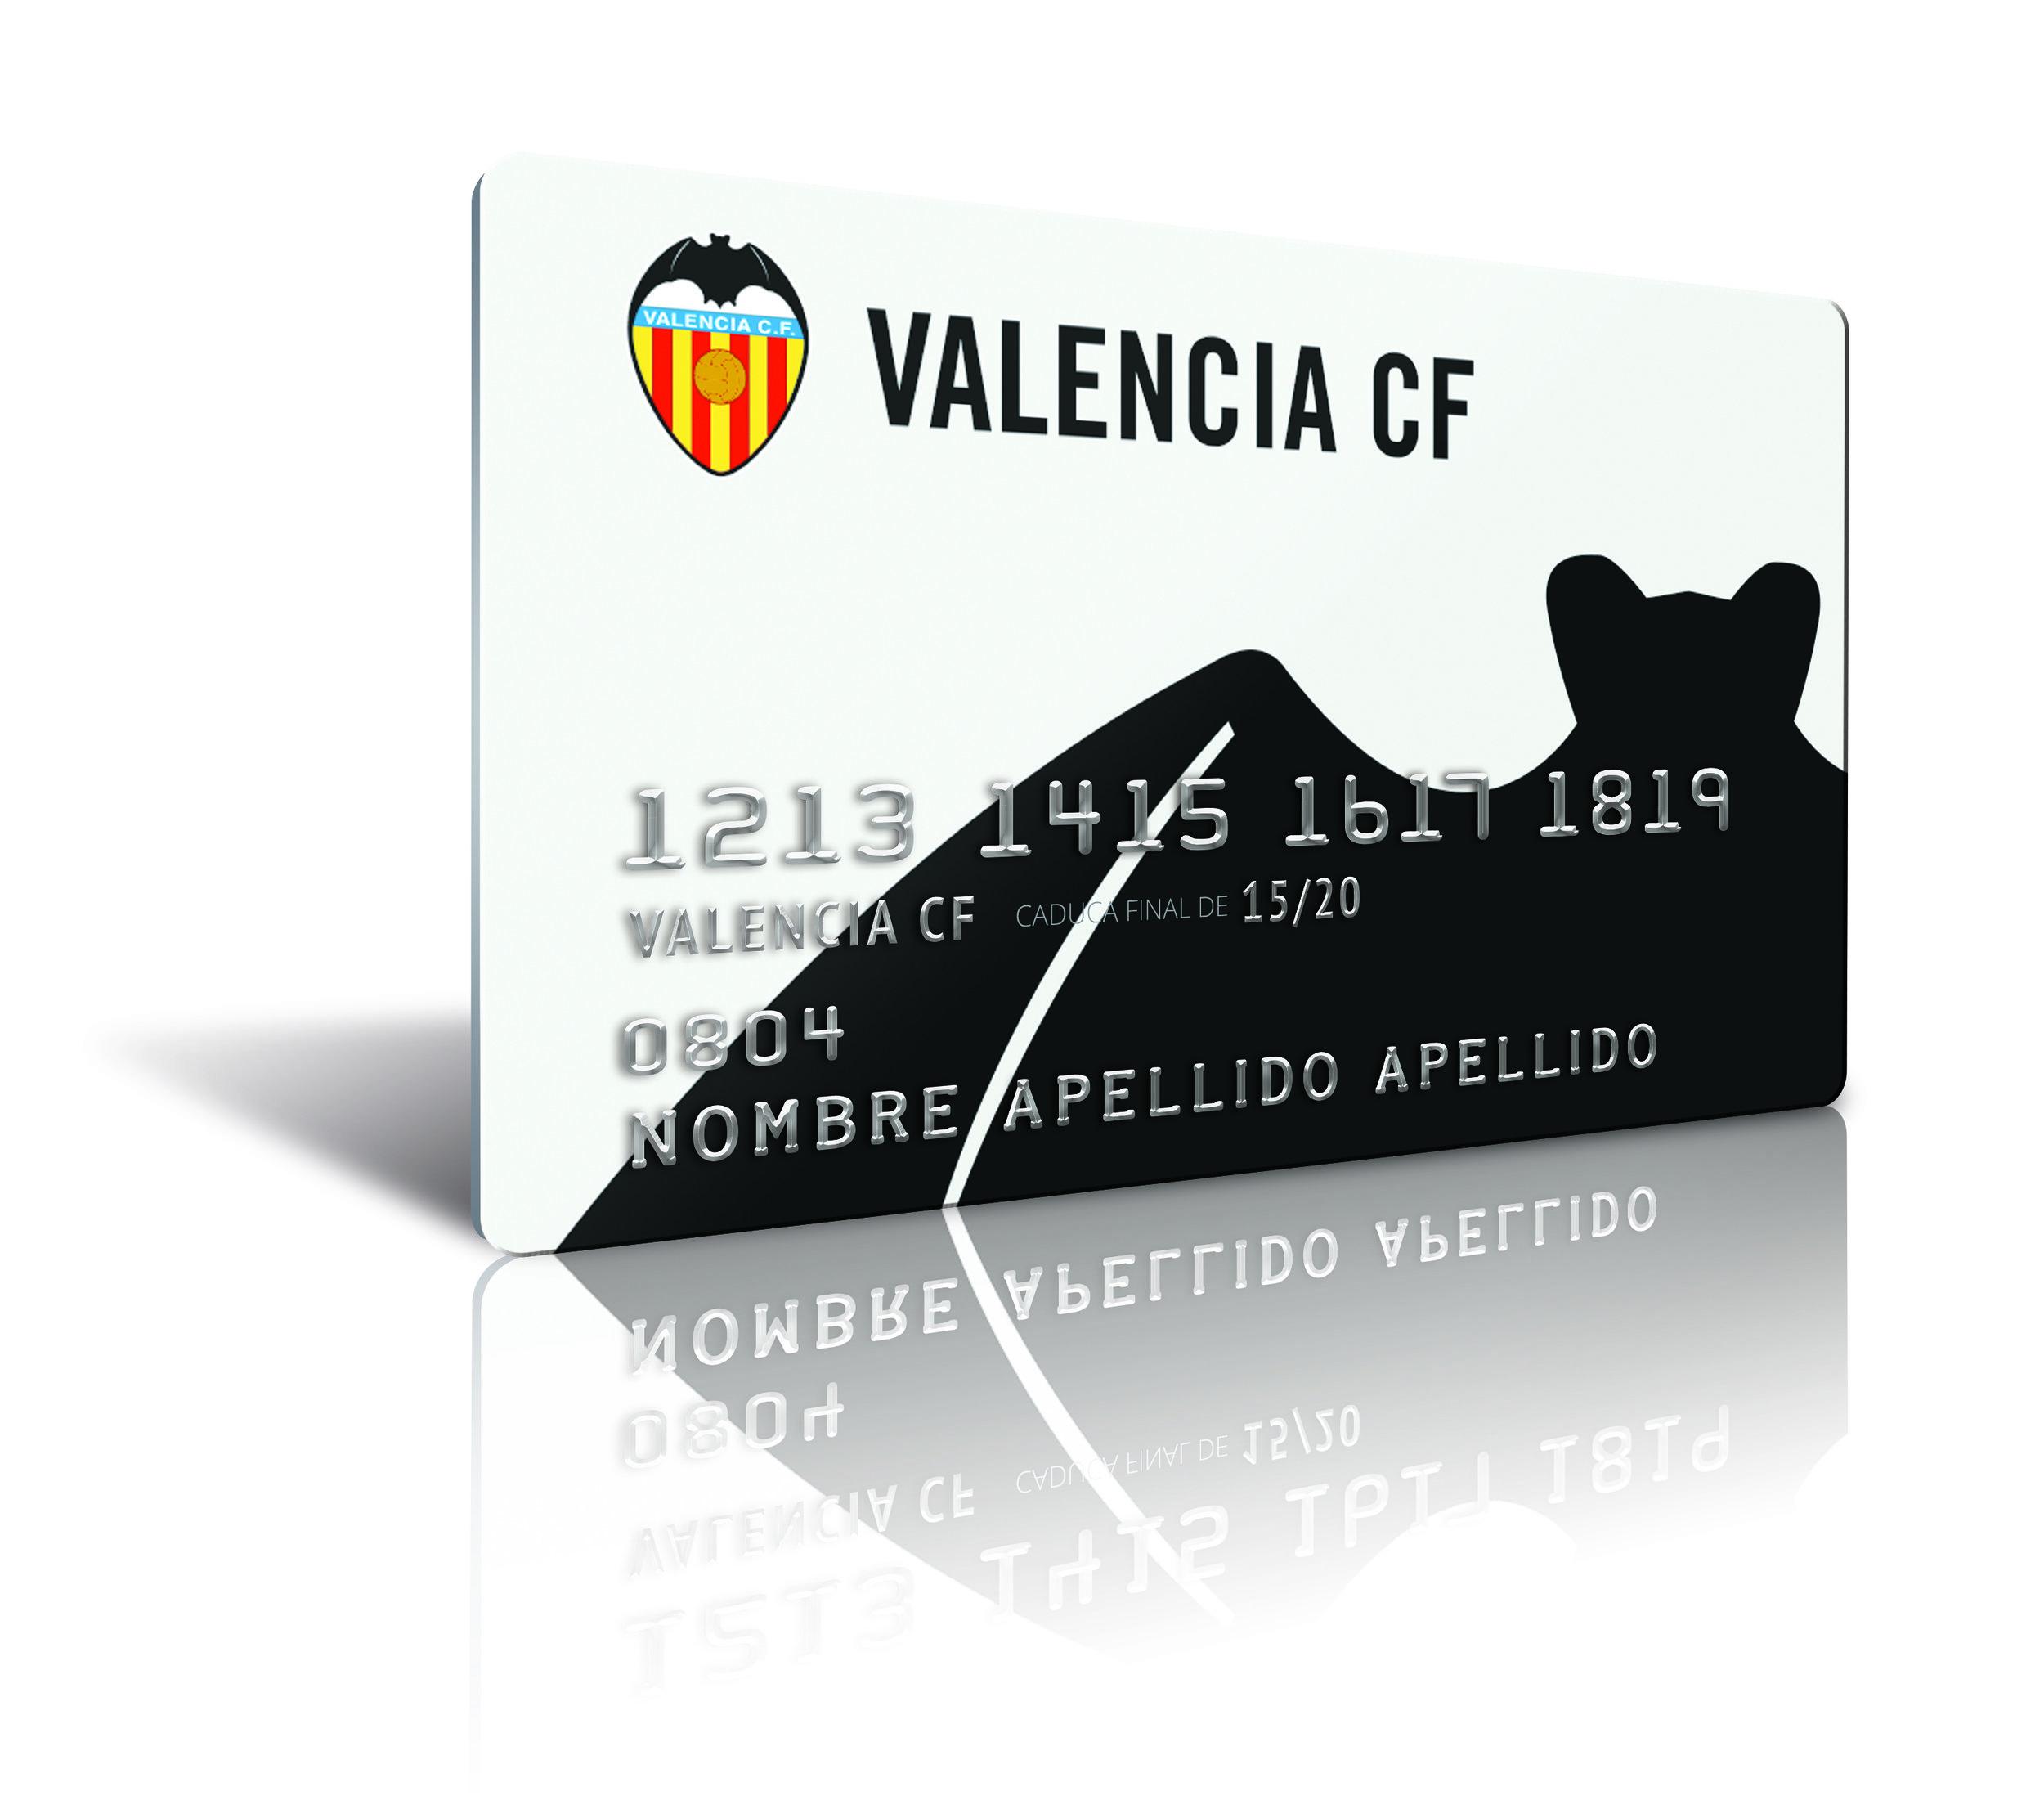 ValenciaCF.jpg